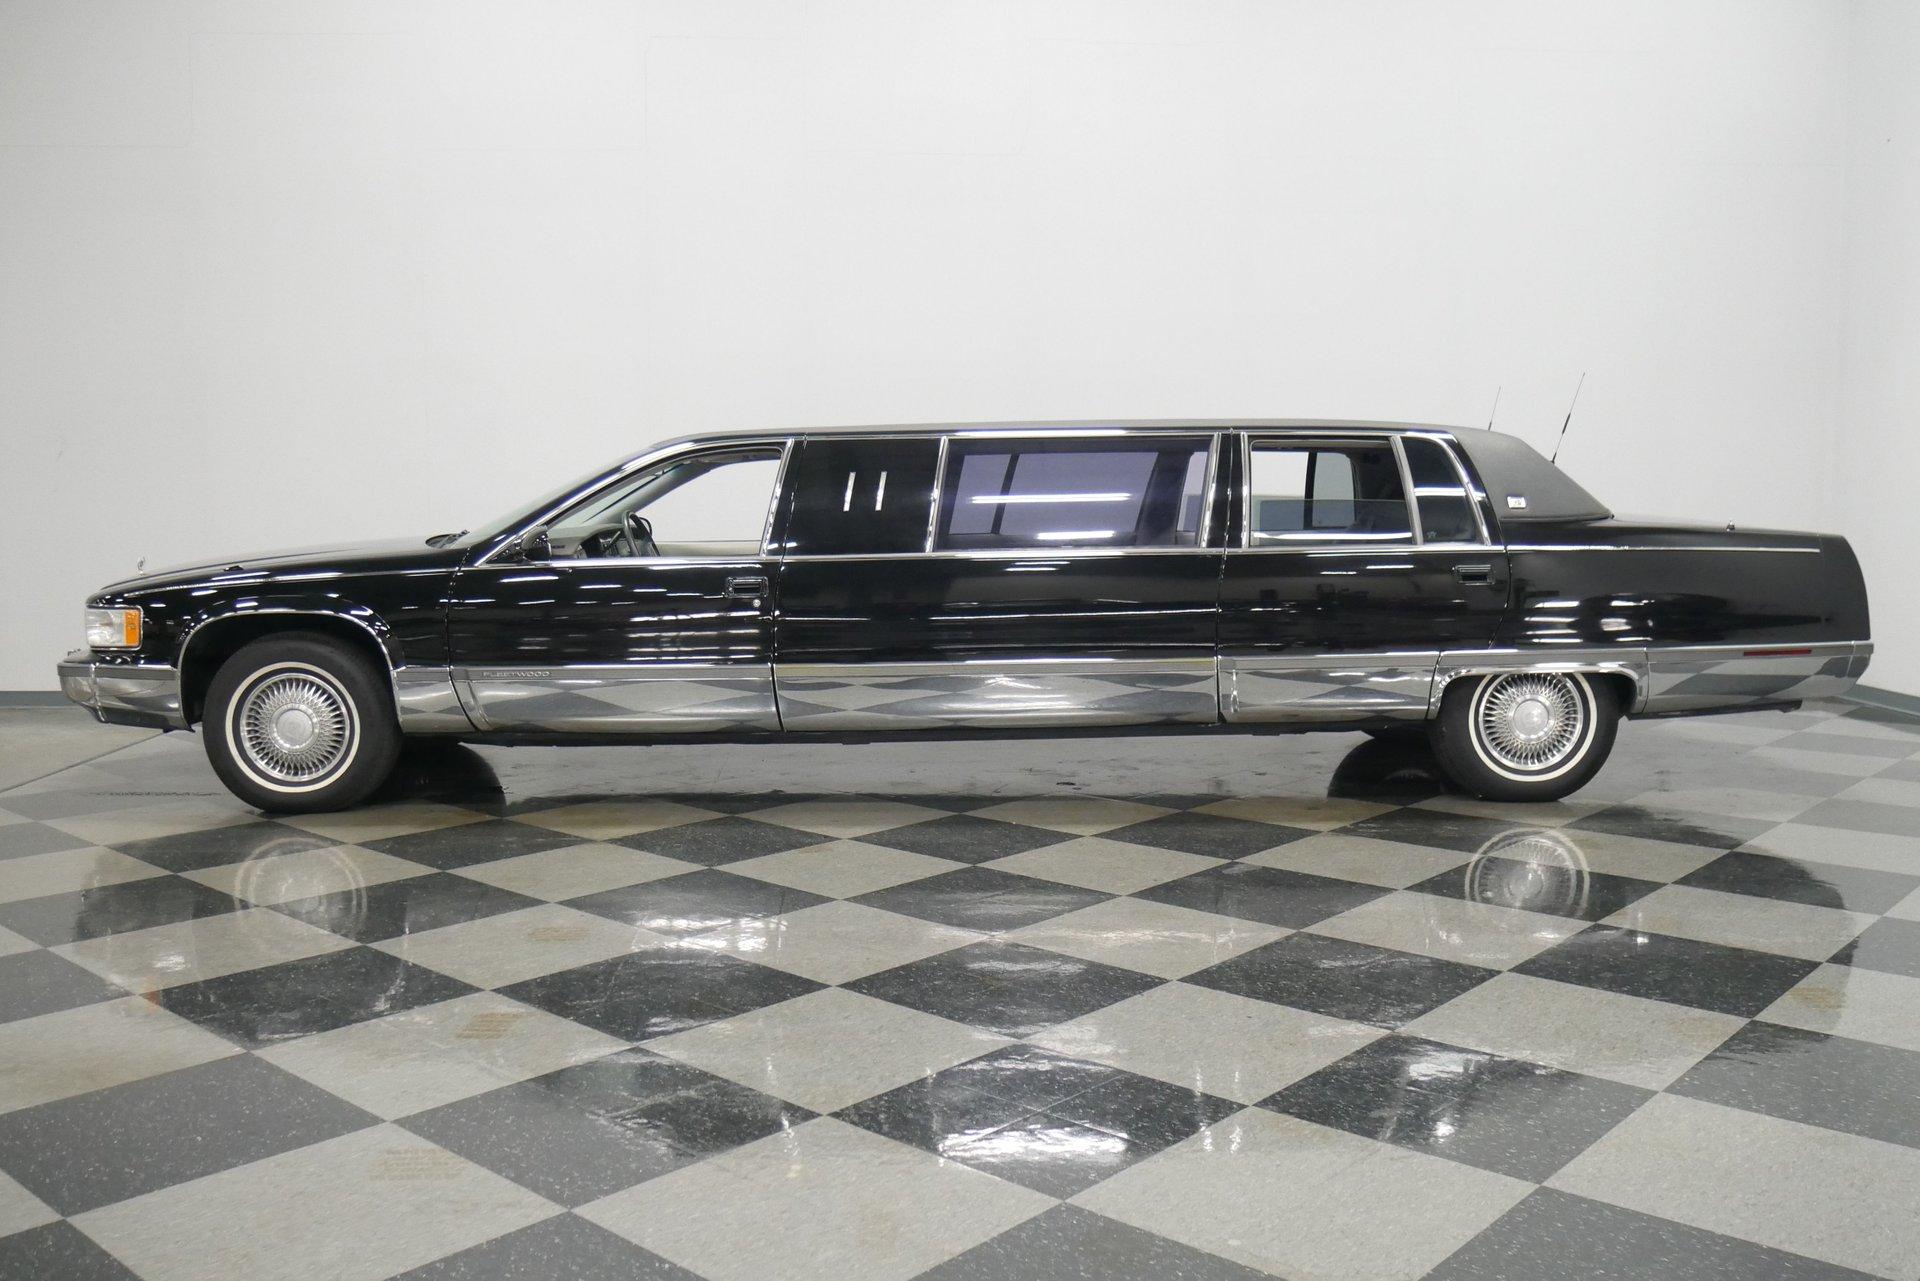 1995 cadillac fleetwood limousine